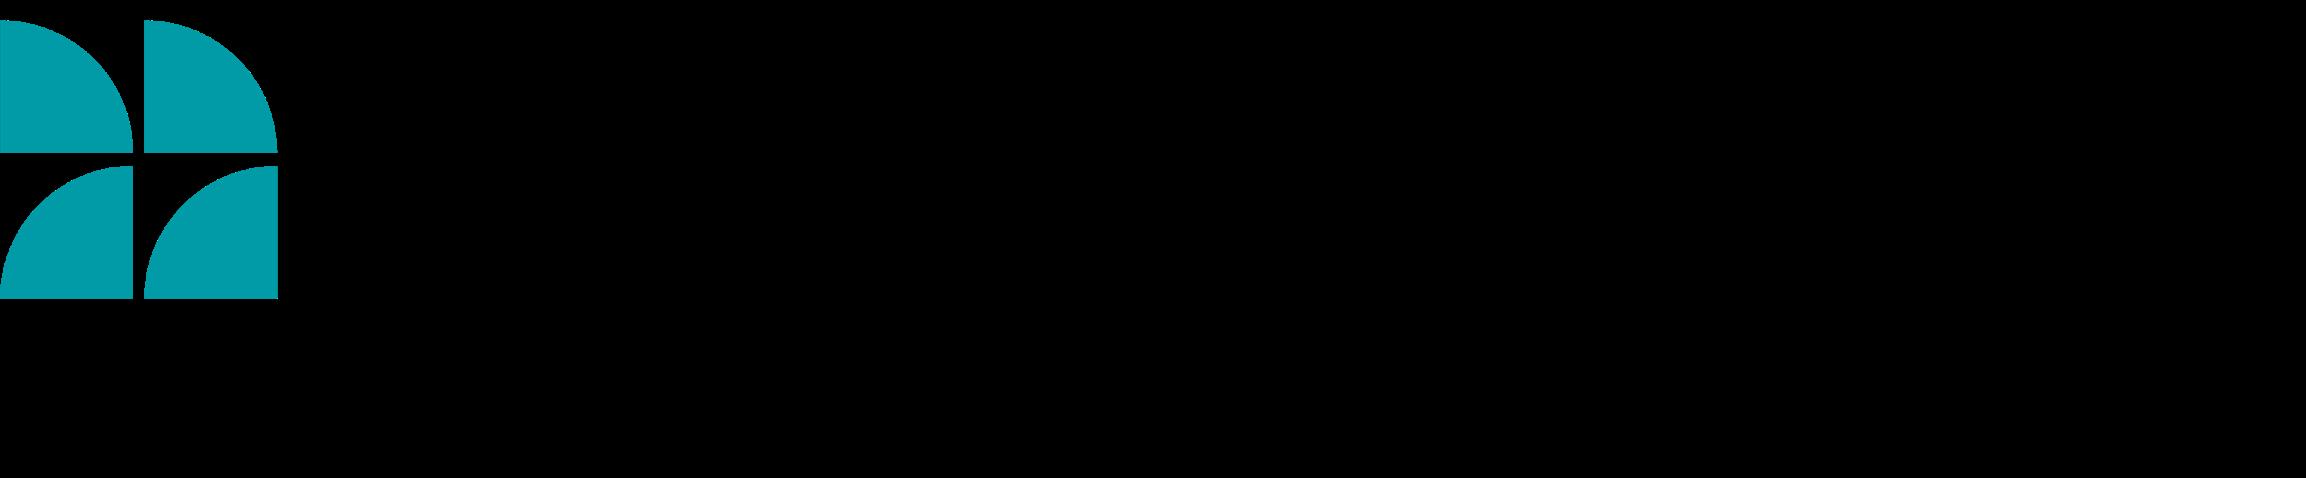 pause_chantier_btp-confinement-tracktor